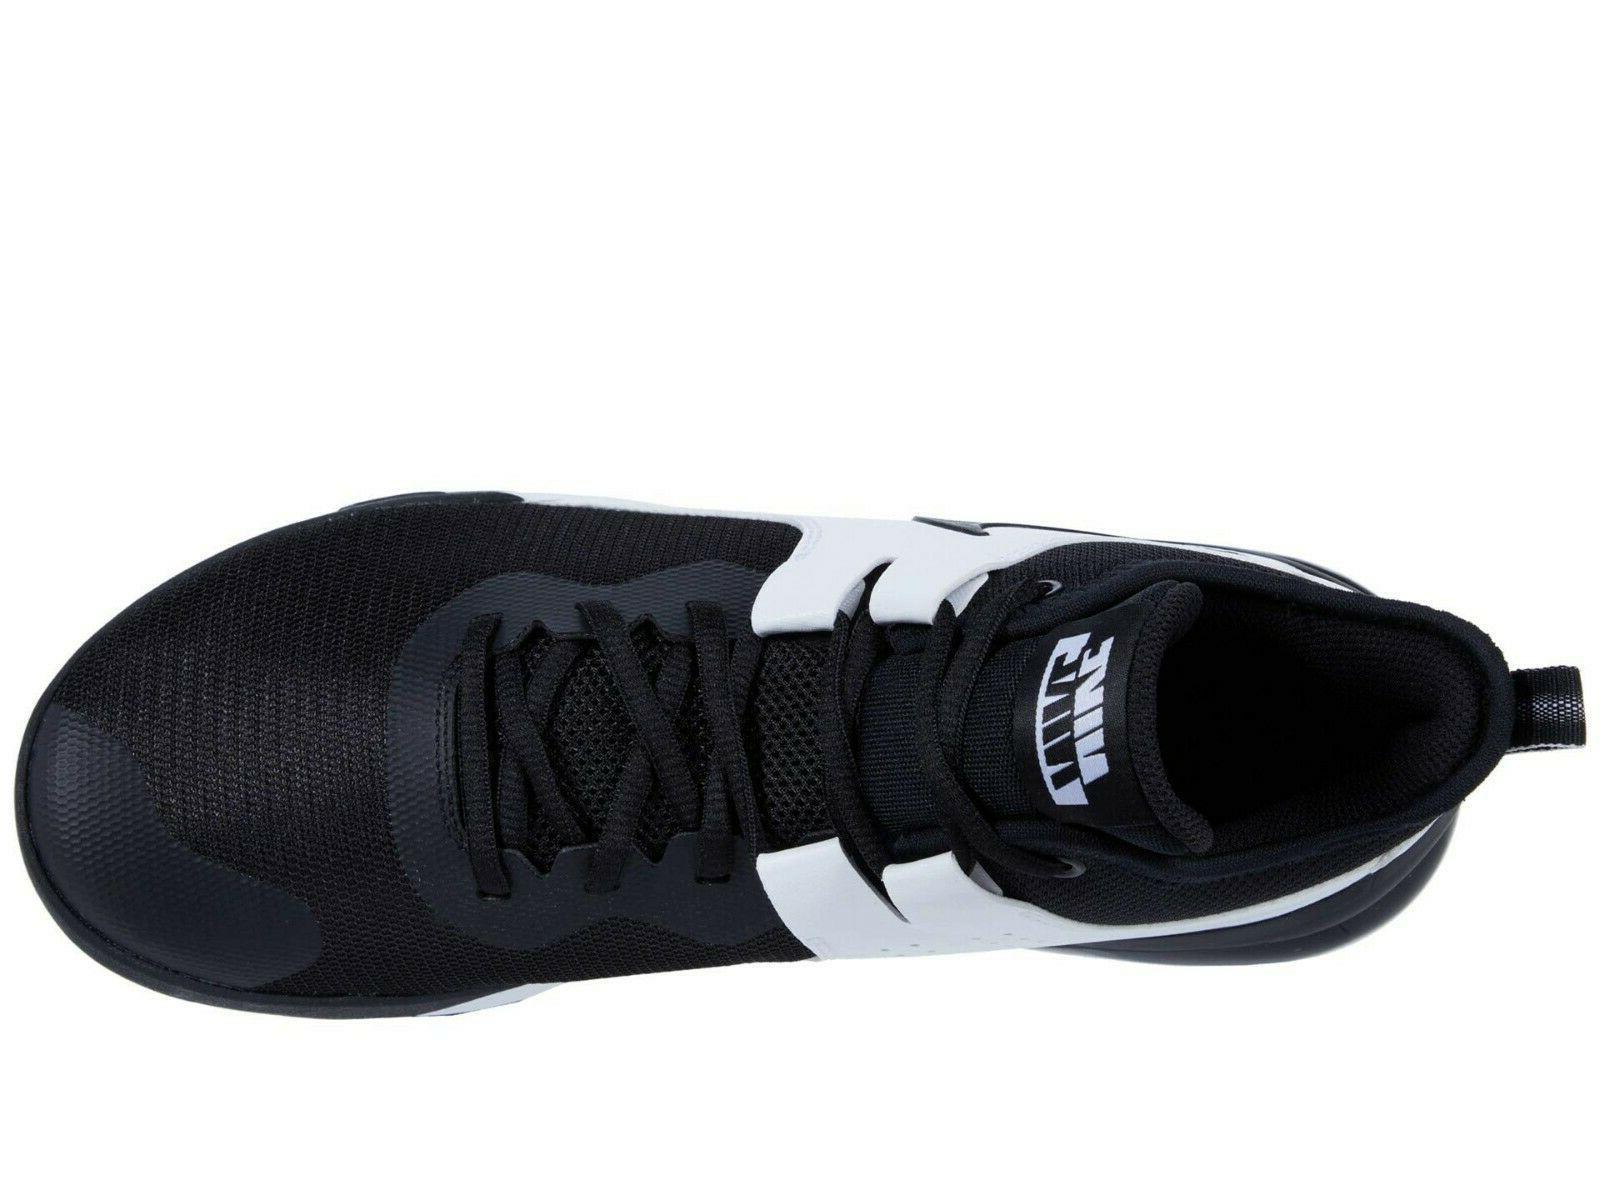 Nike Mens CI1396-004 Shoes